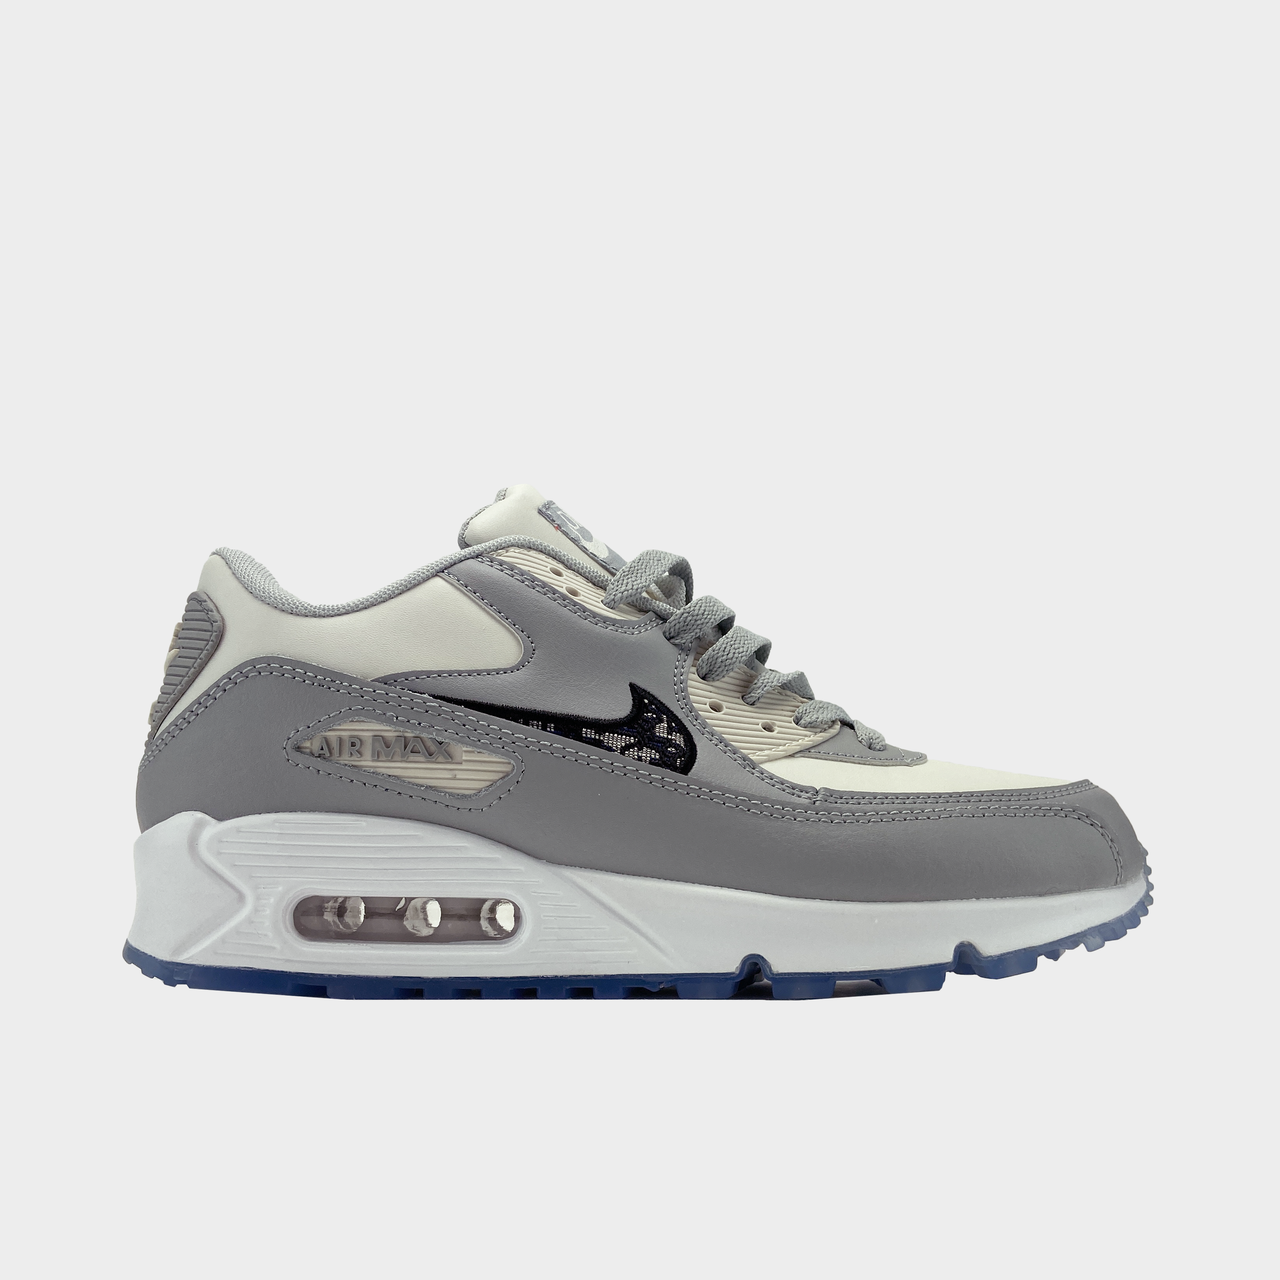 Кроссовки мужские Nike Air Max 90 Grey White (Серый). Мужские кроссовки Найк Аир Макс серого цвета.